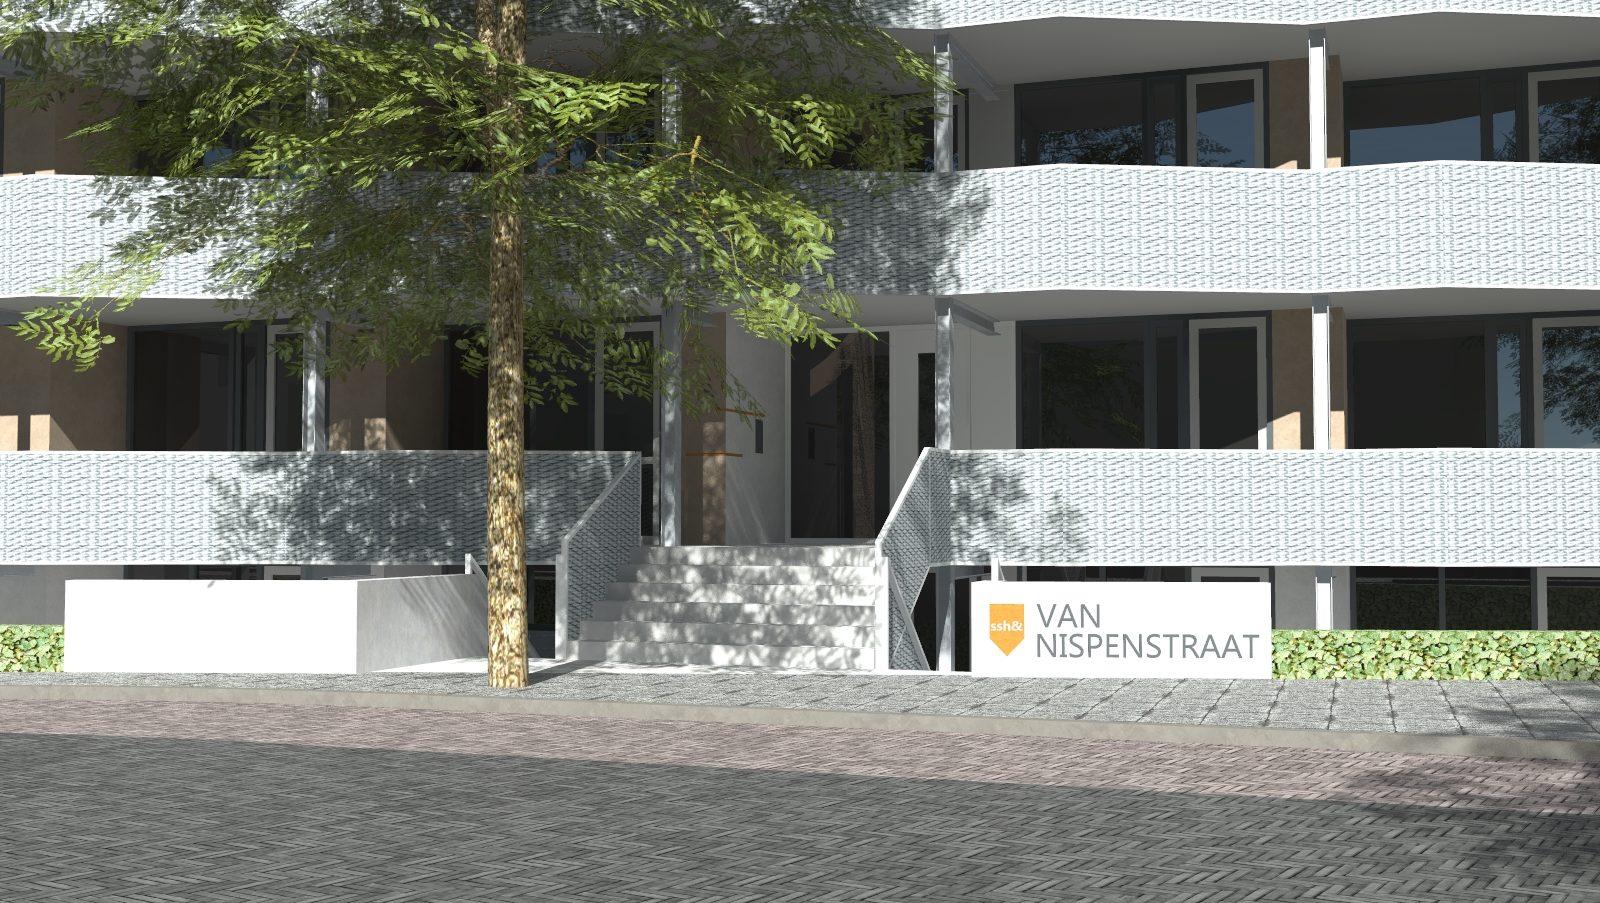 Detail MD Strekmetaal balustrades Nispenstraat Nijmegen